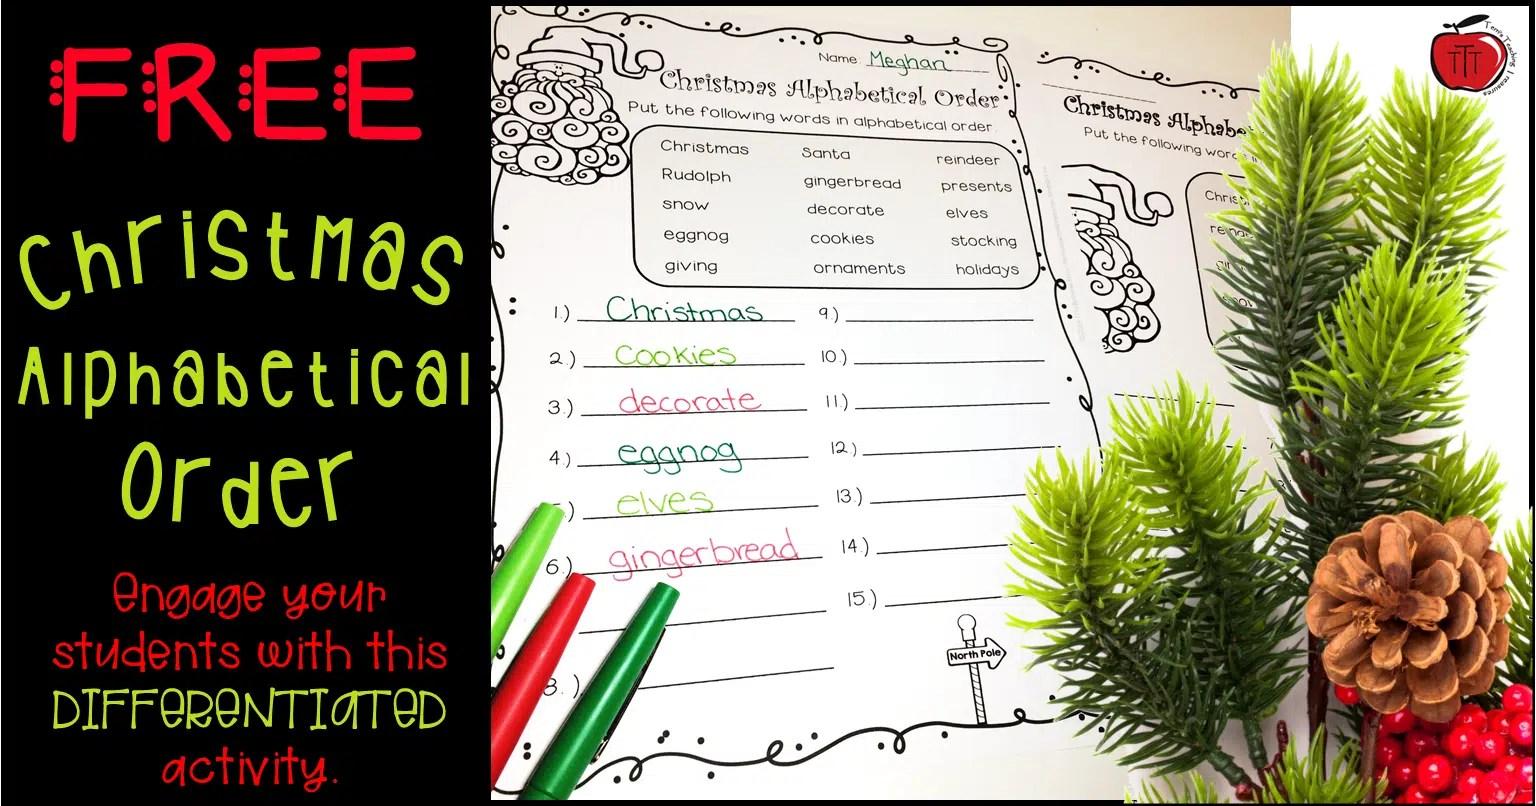 Free Christmas Alphabetical Order Worksheets